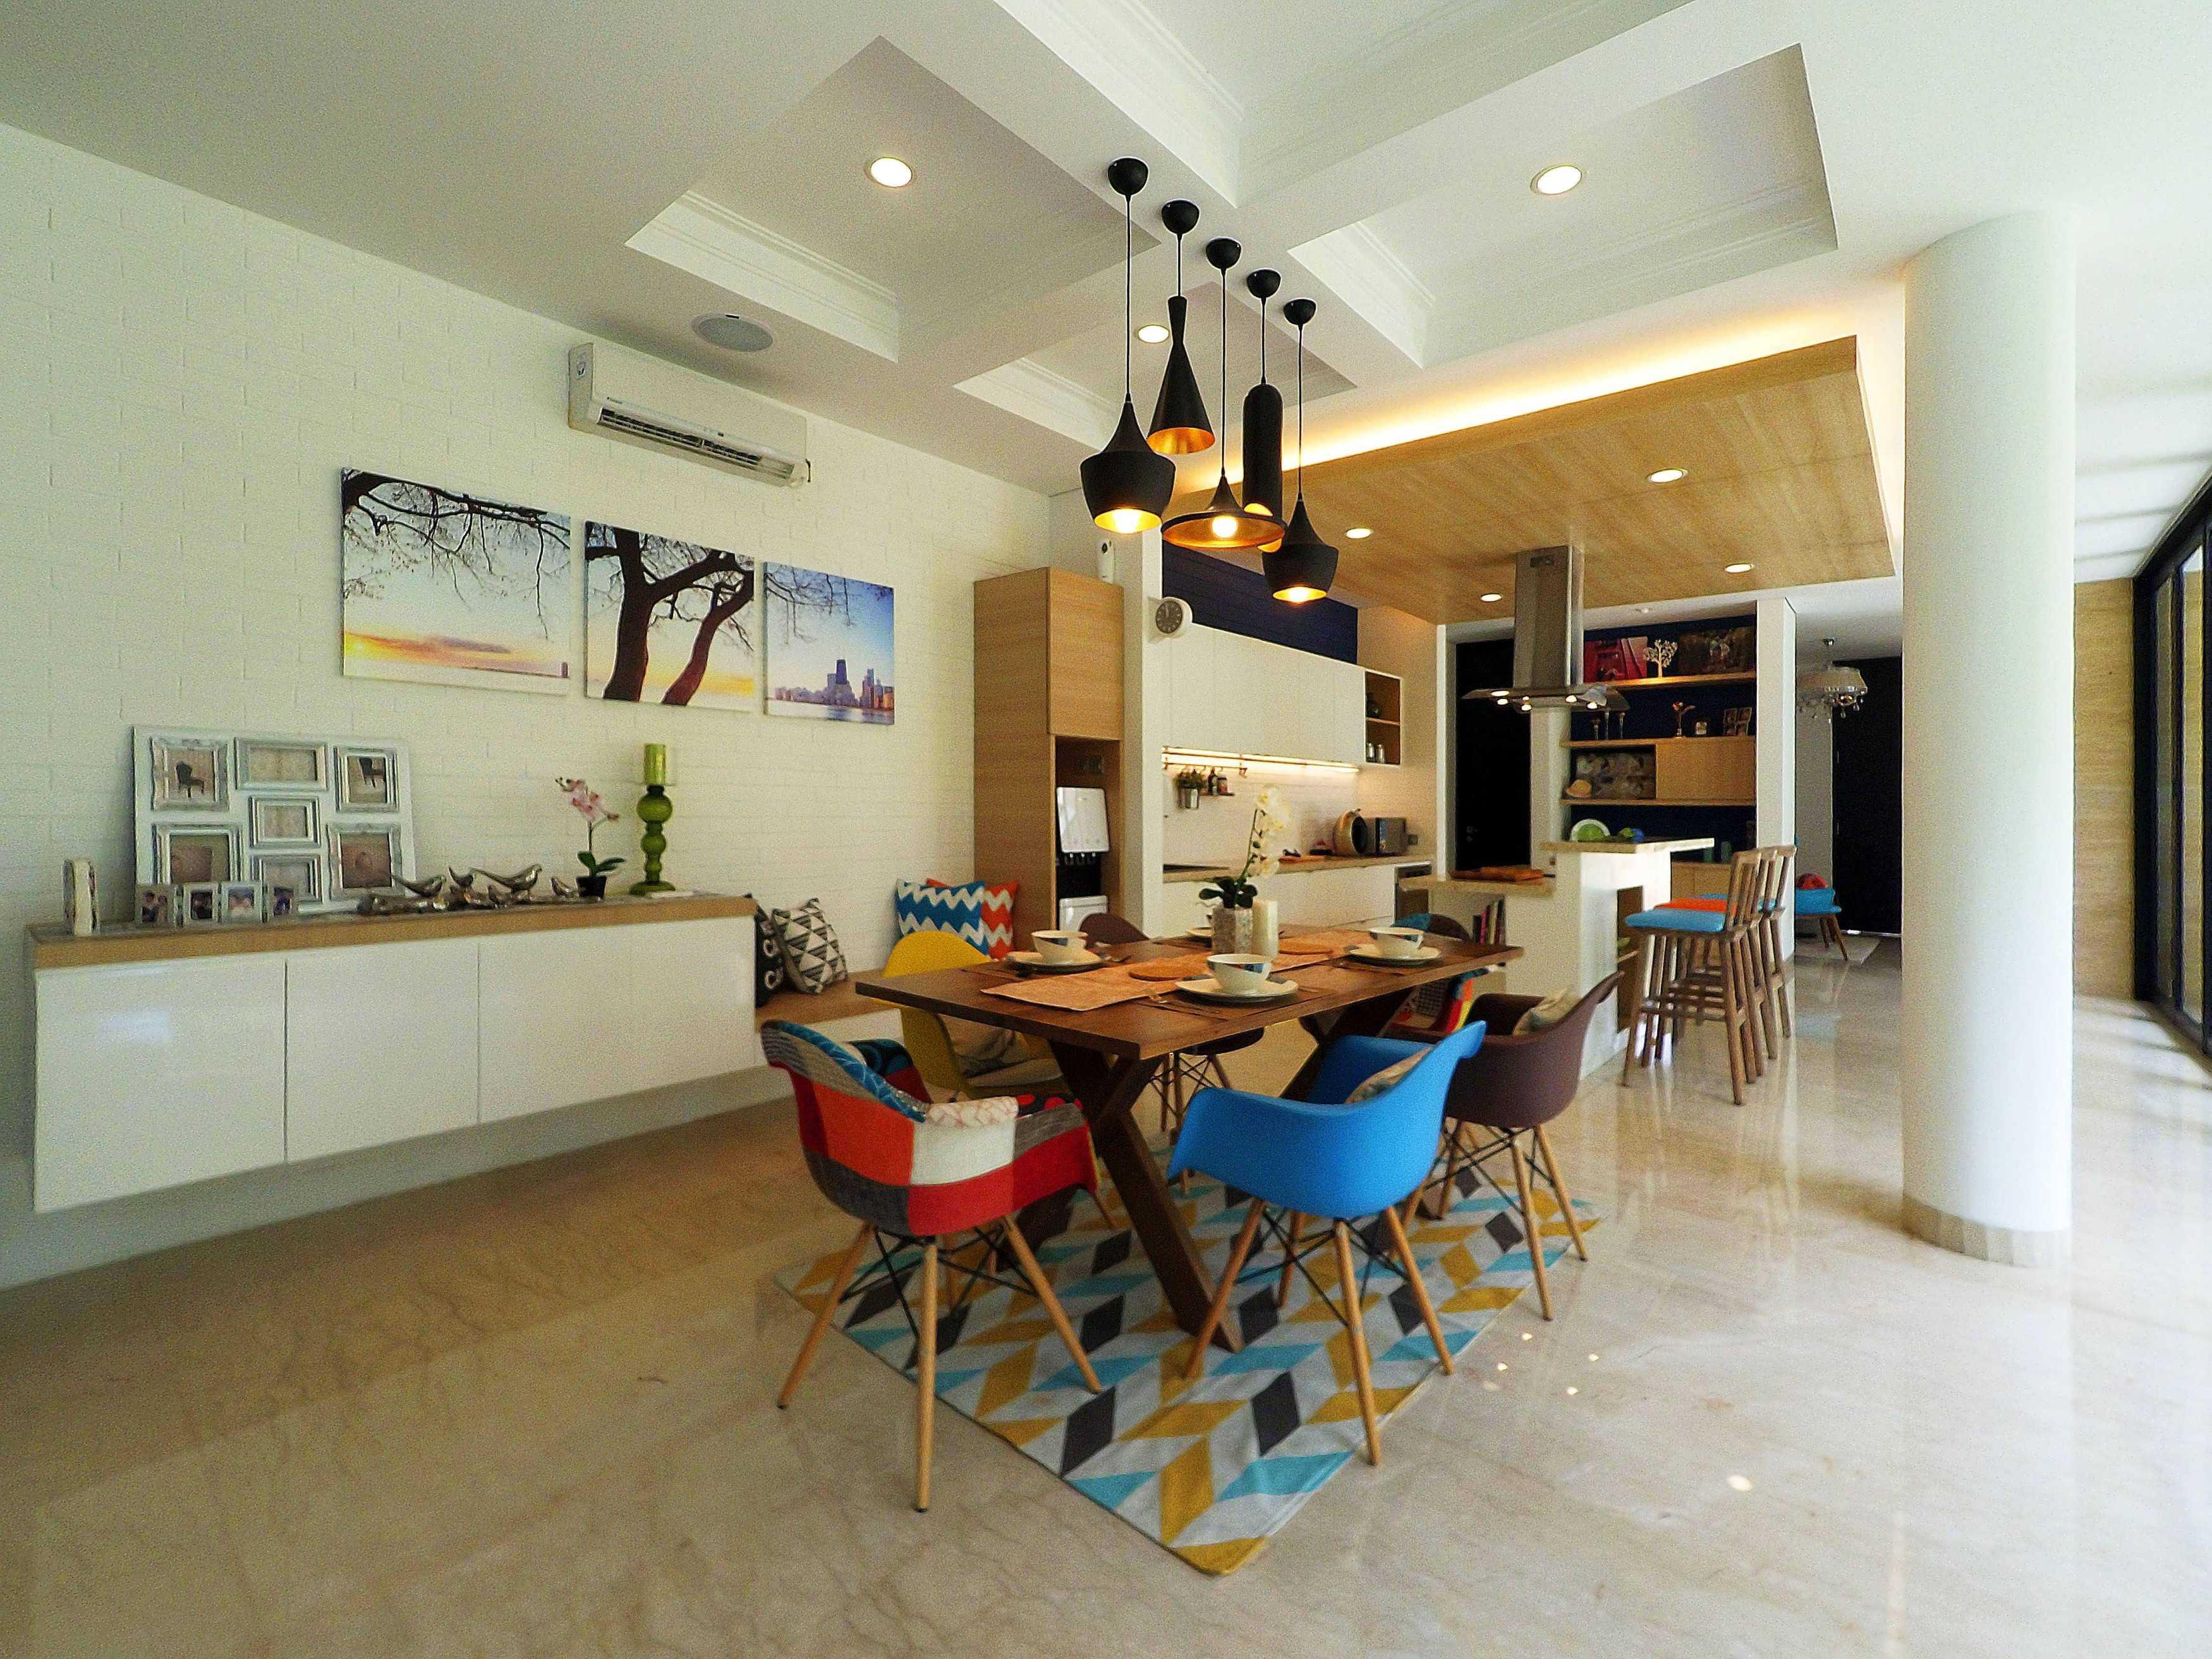 Dezan Studio Interior - Pantry & Dining Pondok Indah, Jakarta Pondok Indah, Jakarta Dining Area Minimalis  19394